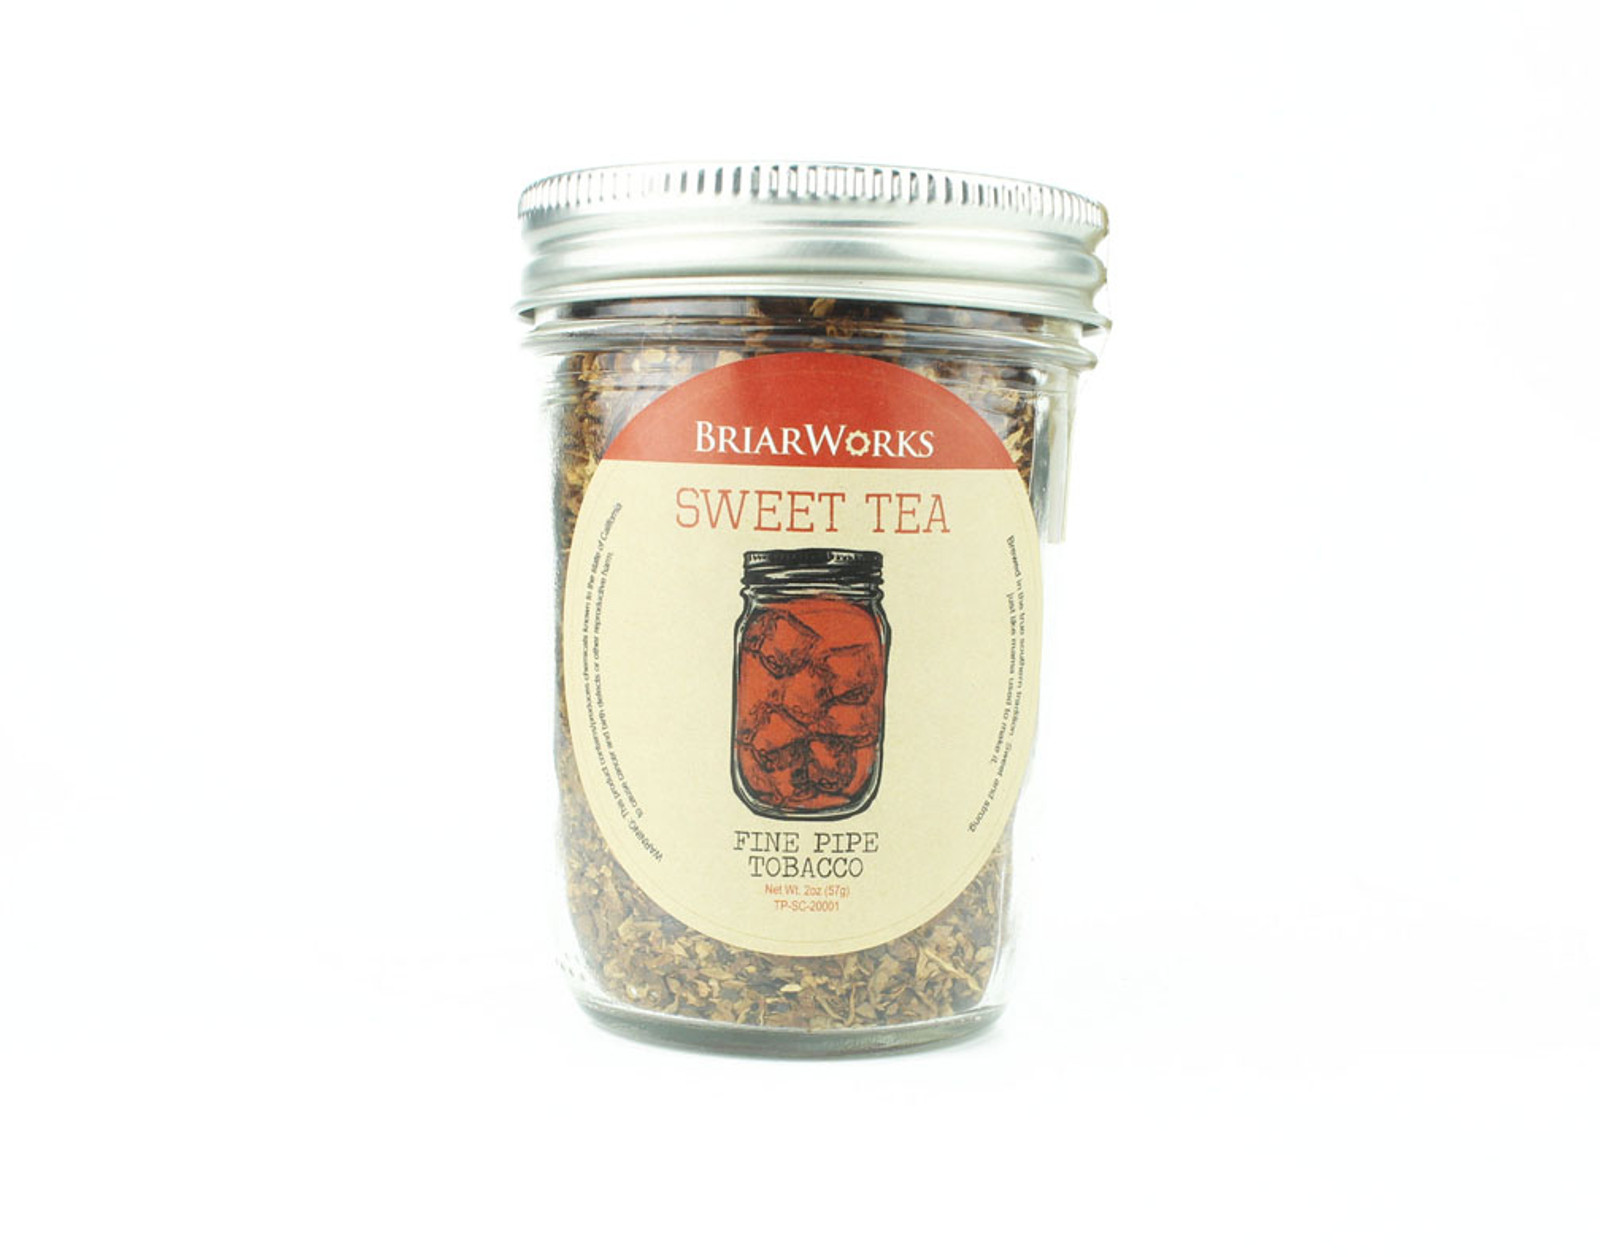 BriarWorks Sweet Tea (2 oz)